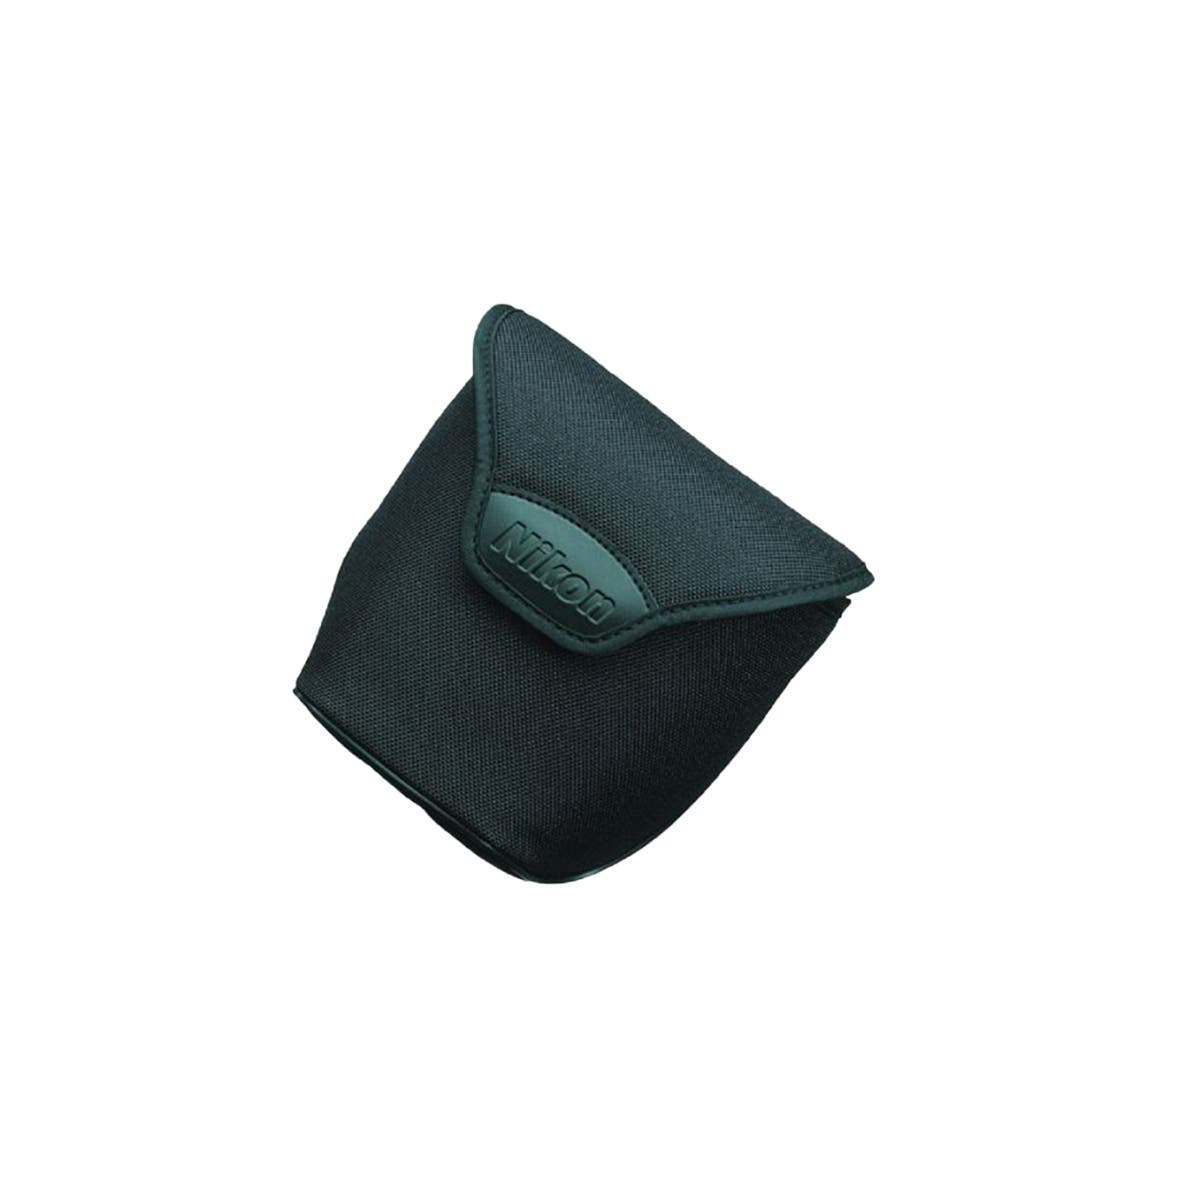 Travelite VI 25mm case